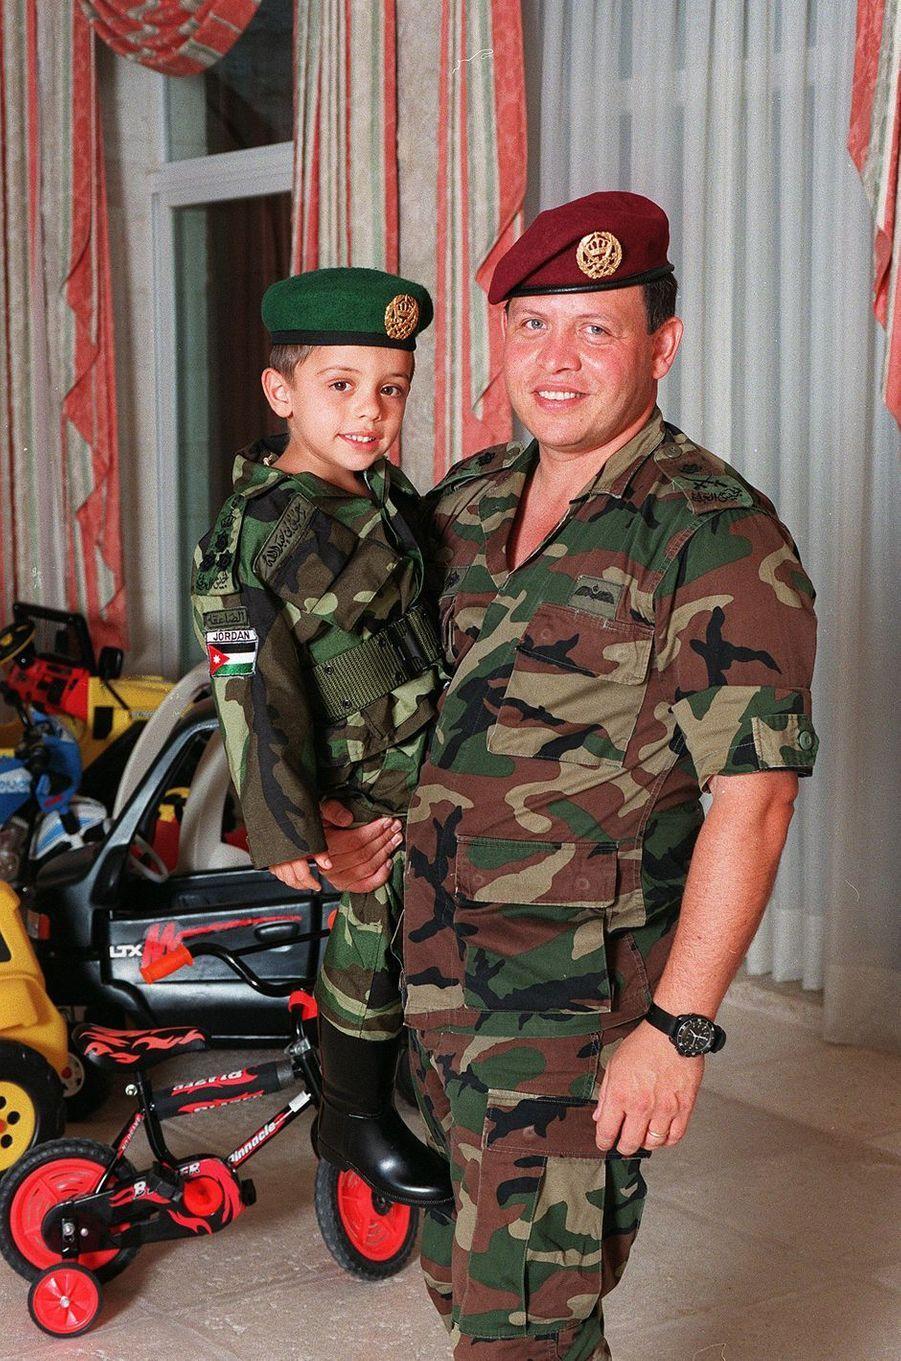 Le prince Hussein de Jordanie avec son père le prince Adballah, en 1998